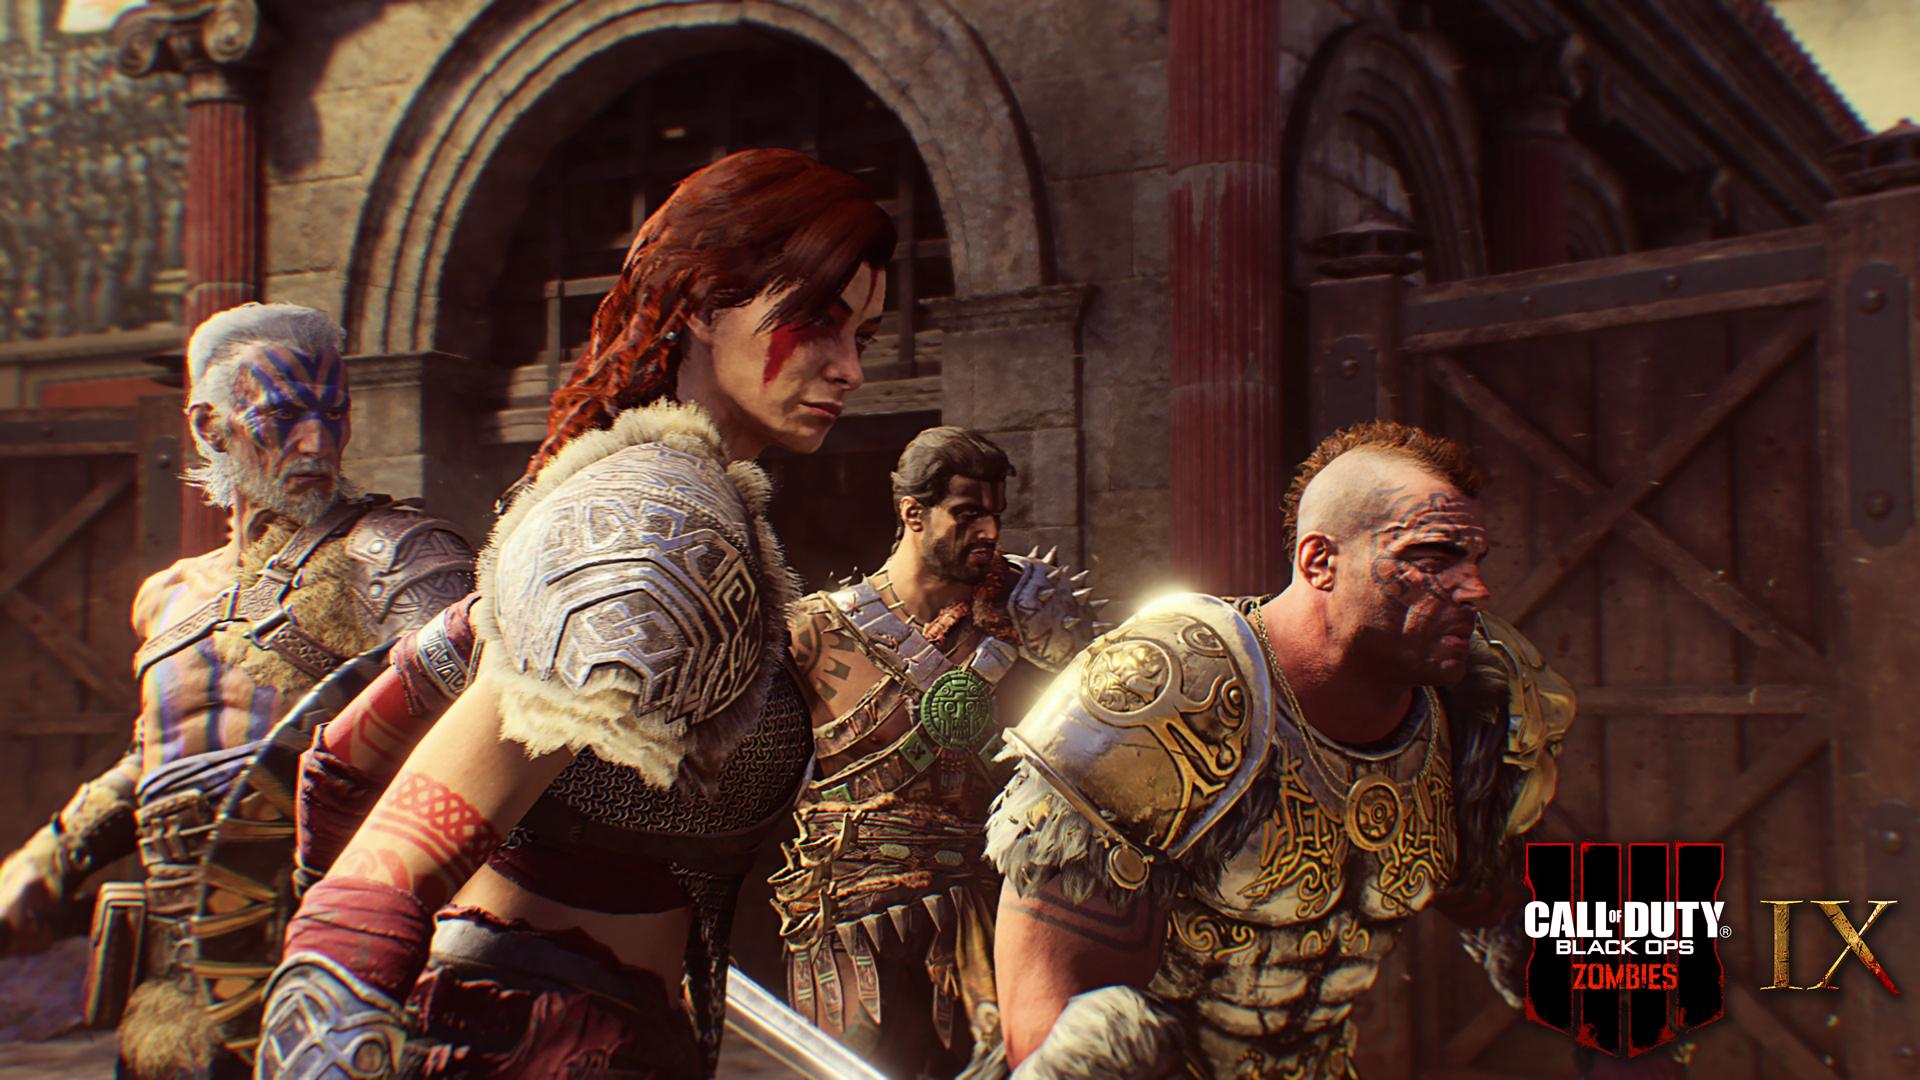 Call of Duty Black Ops 4 Screenshot #3. Bild: Activision